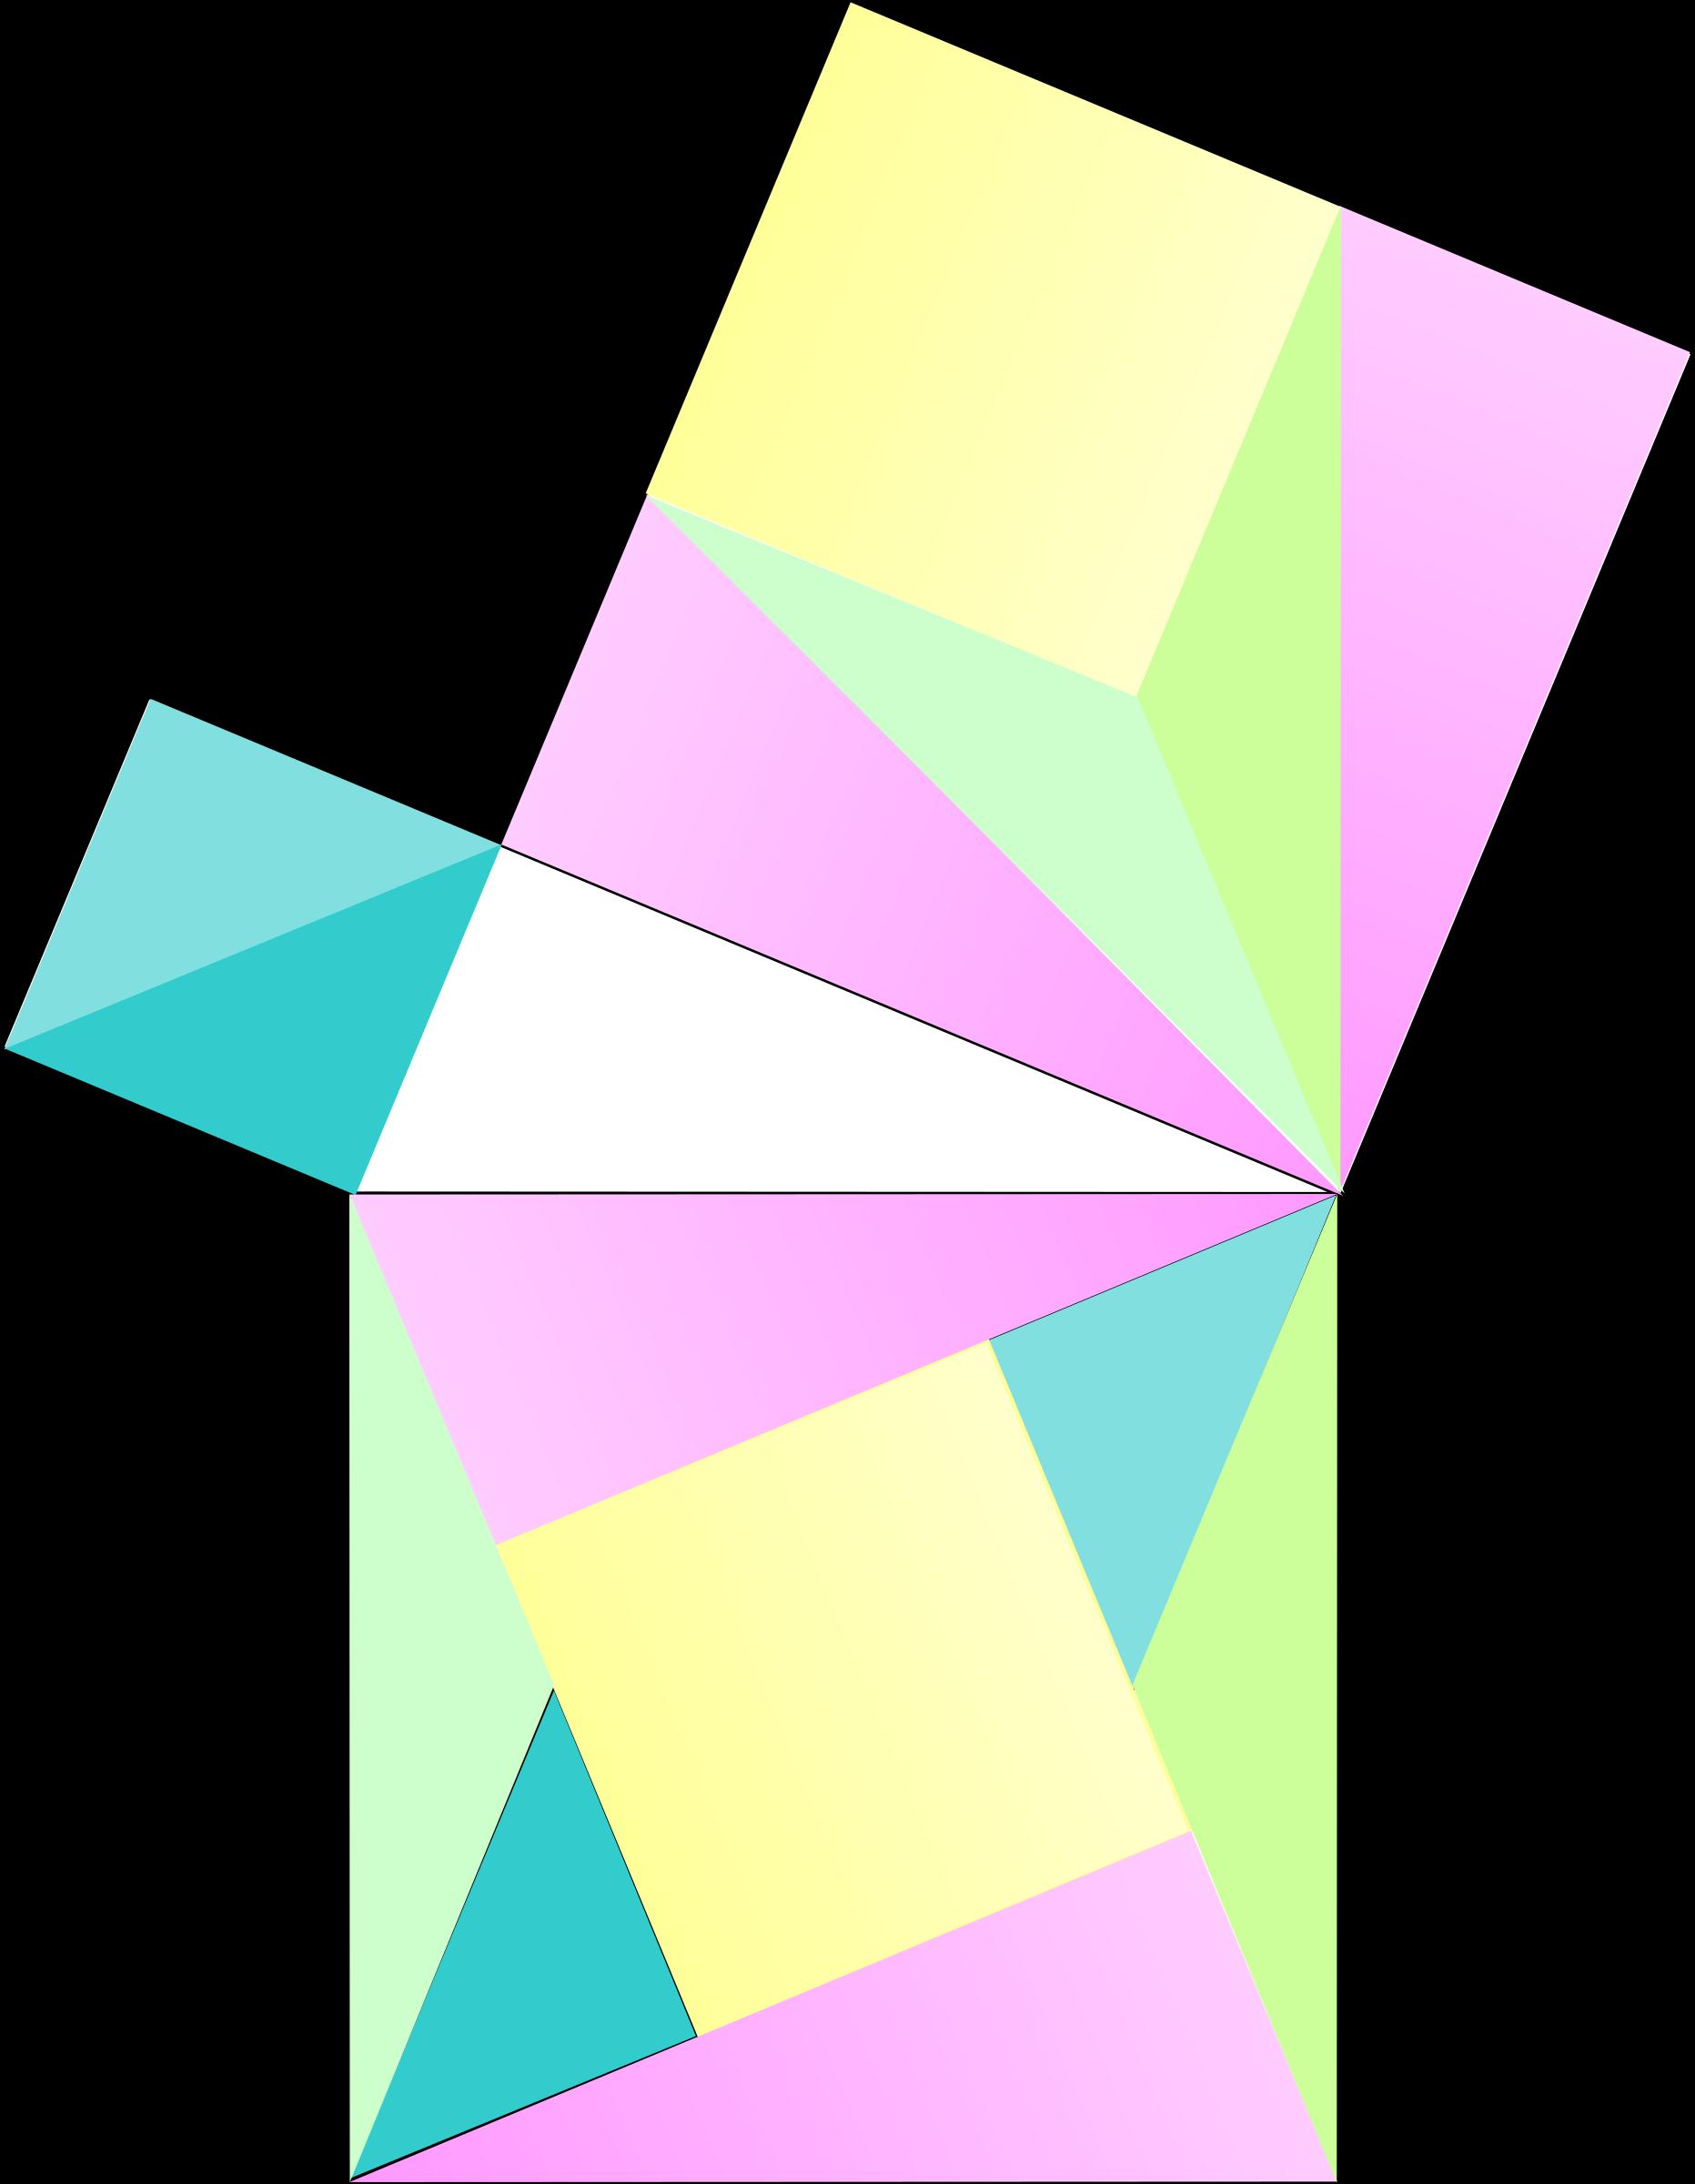 Pythagoras by luc